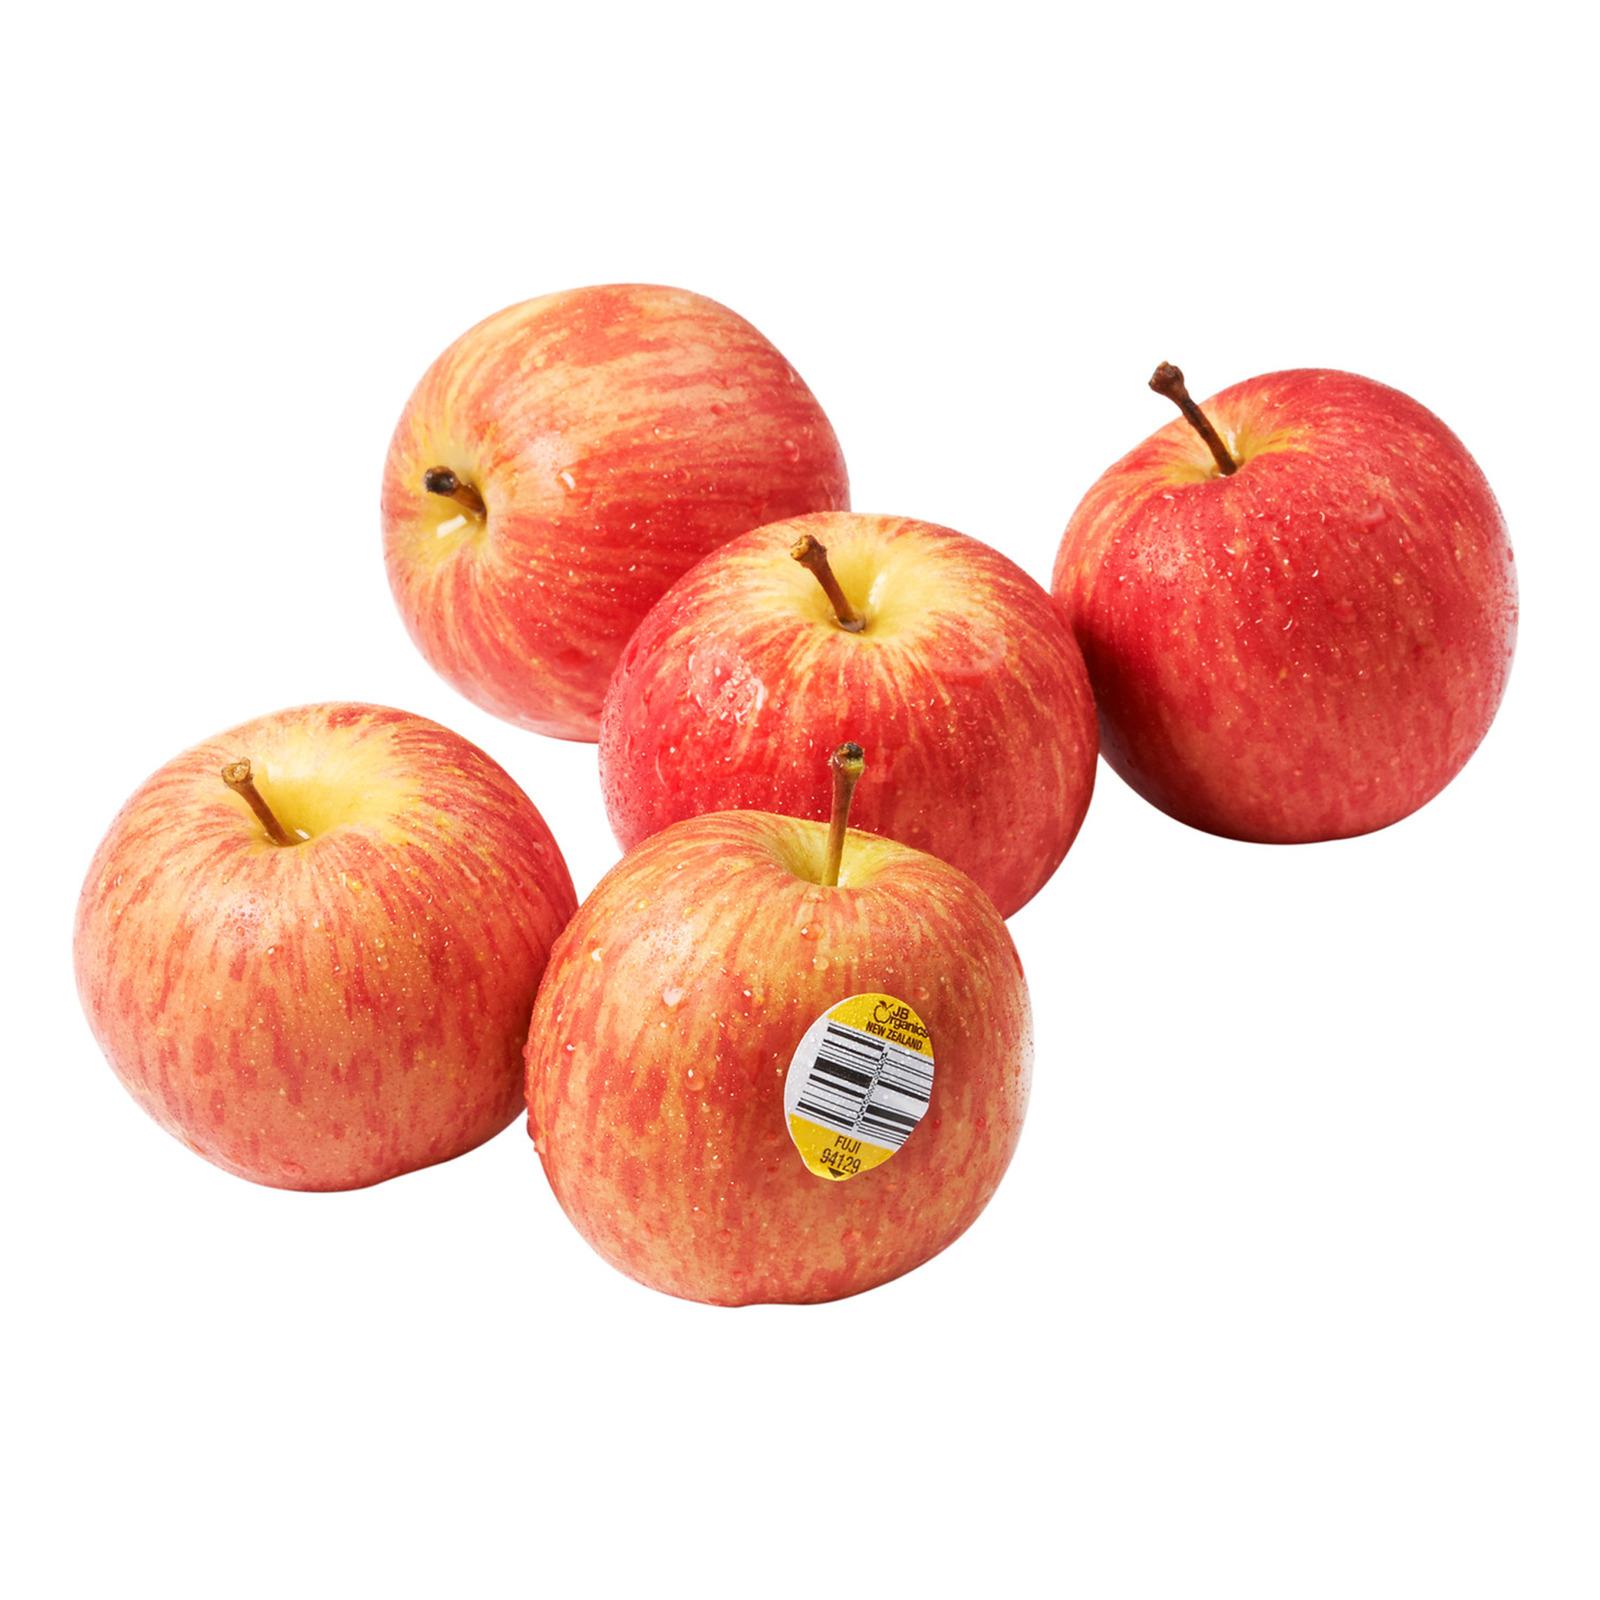 Organic New Zealand Fuji Apple